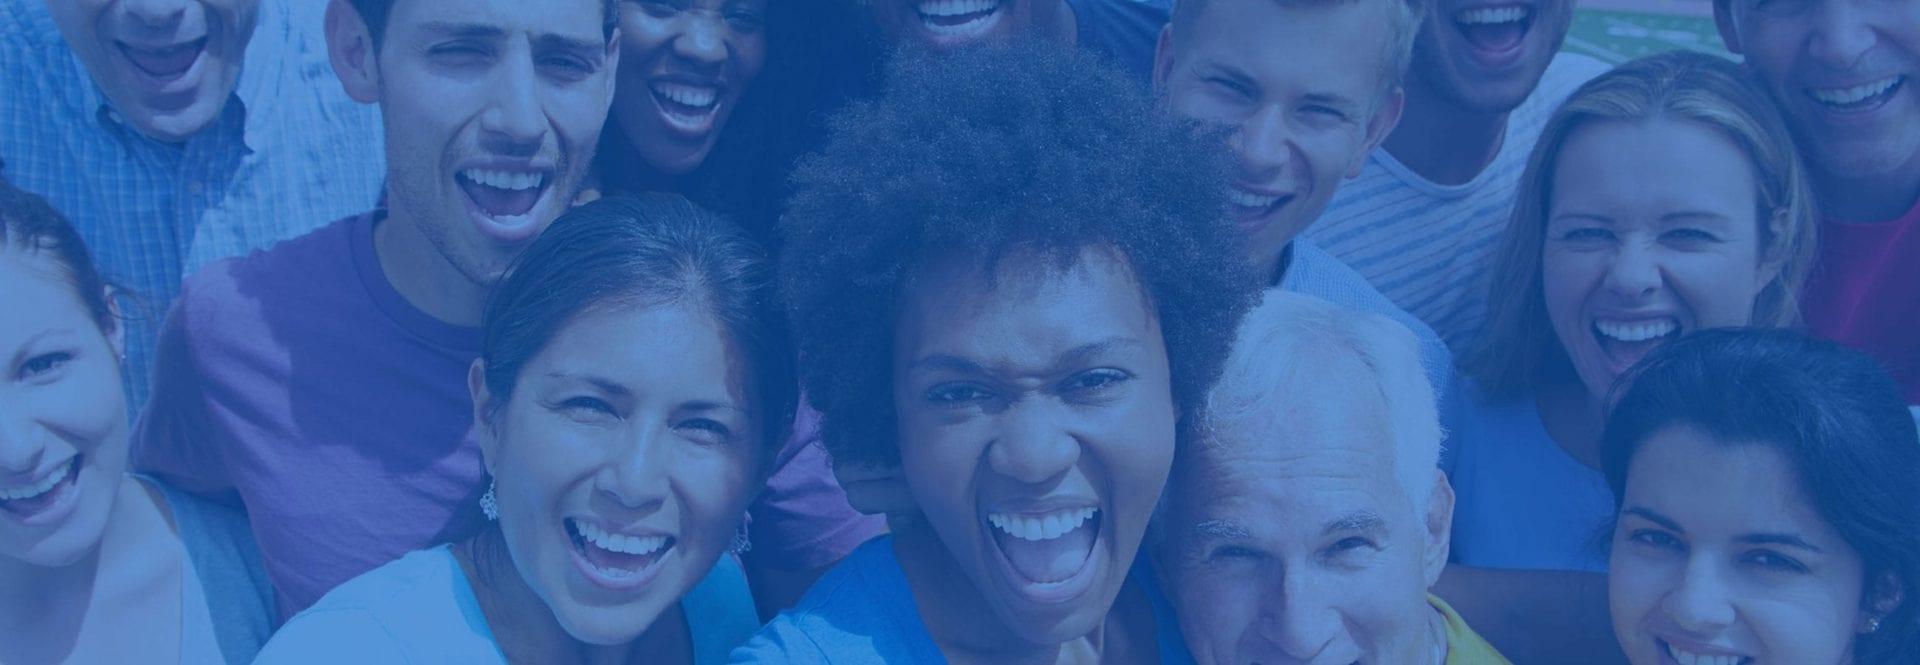 group of people smiling - Edwardsville YMCA